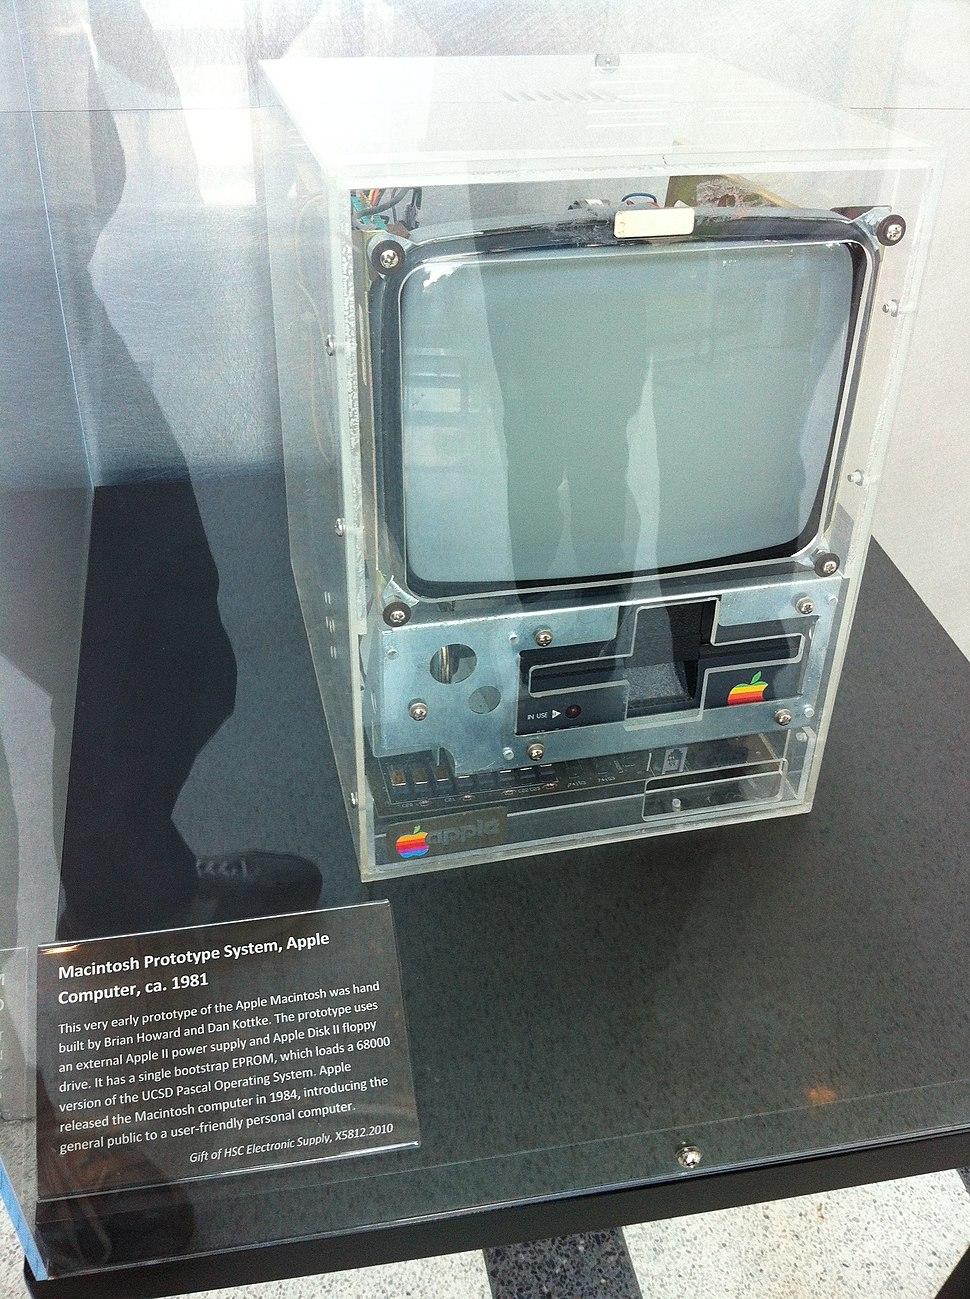 Early Macintosh Prototype Computer History Museum Mountain View California 2013-04-11 23-45